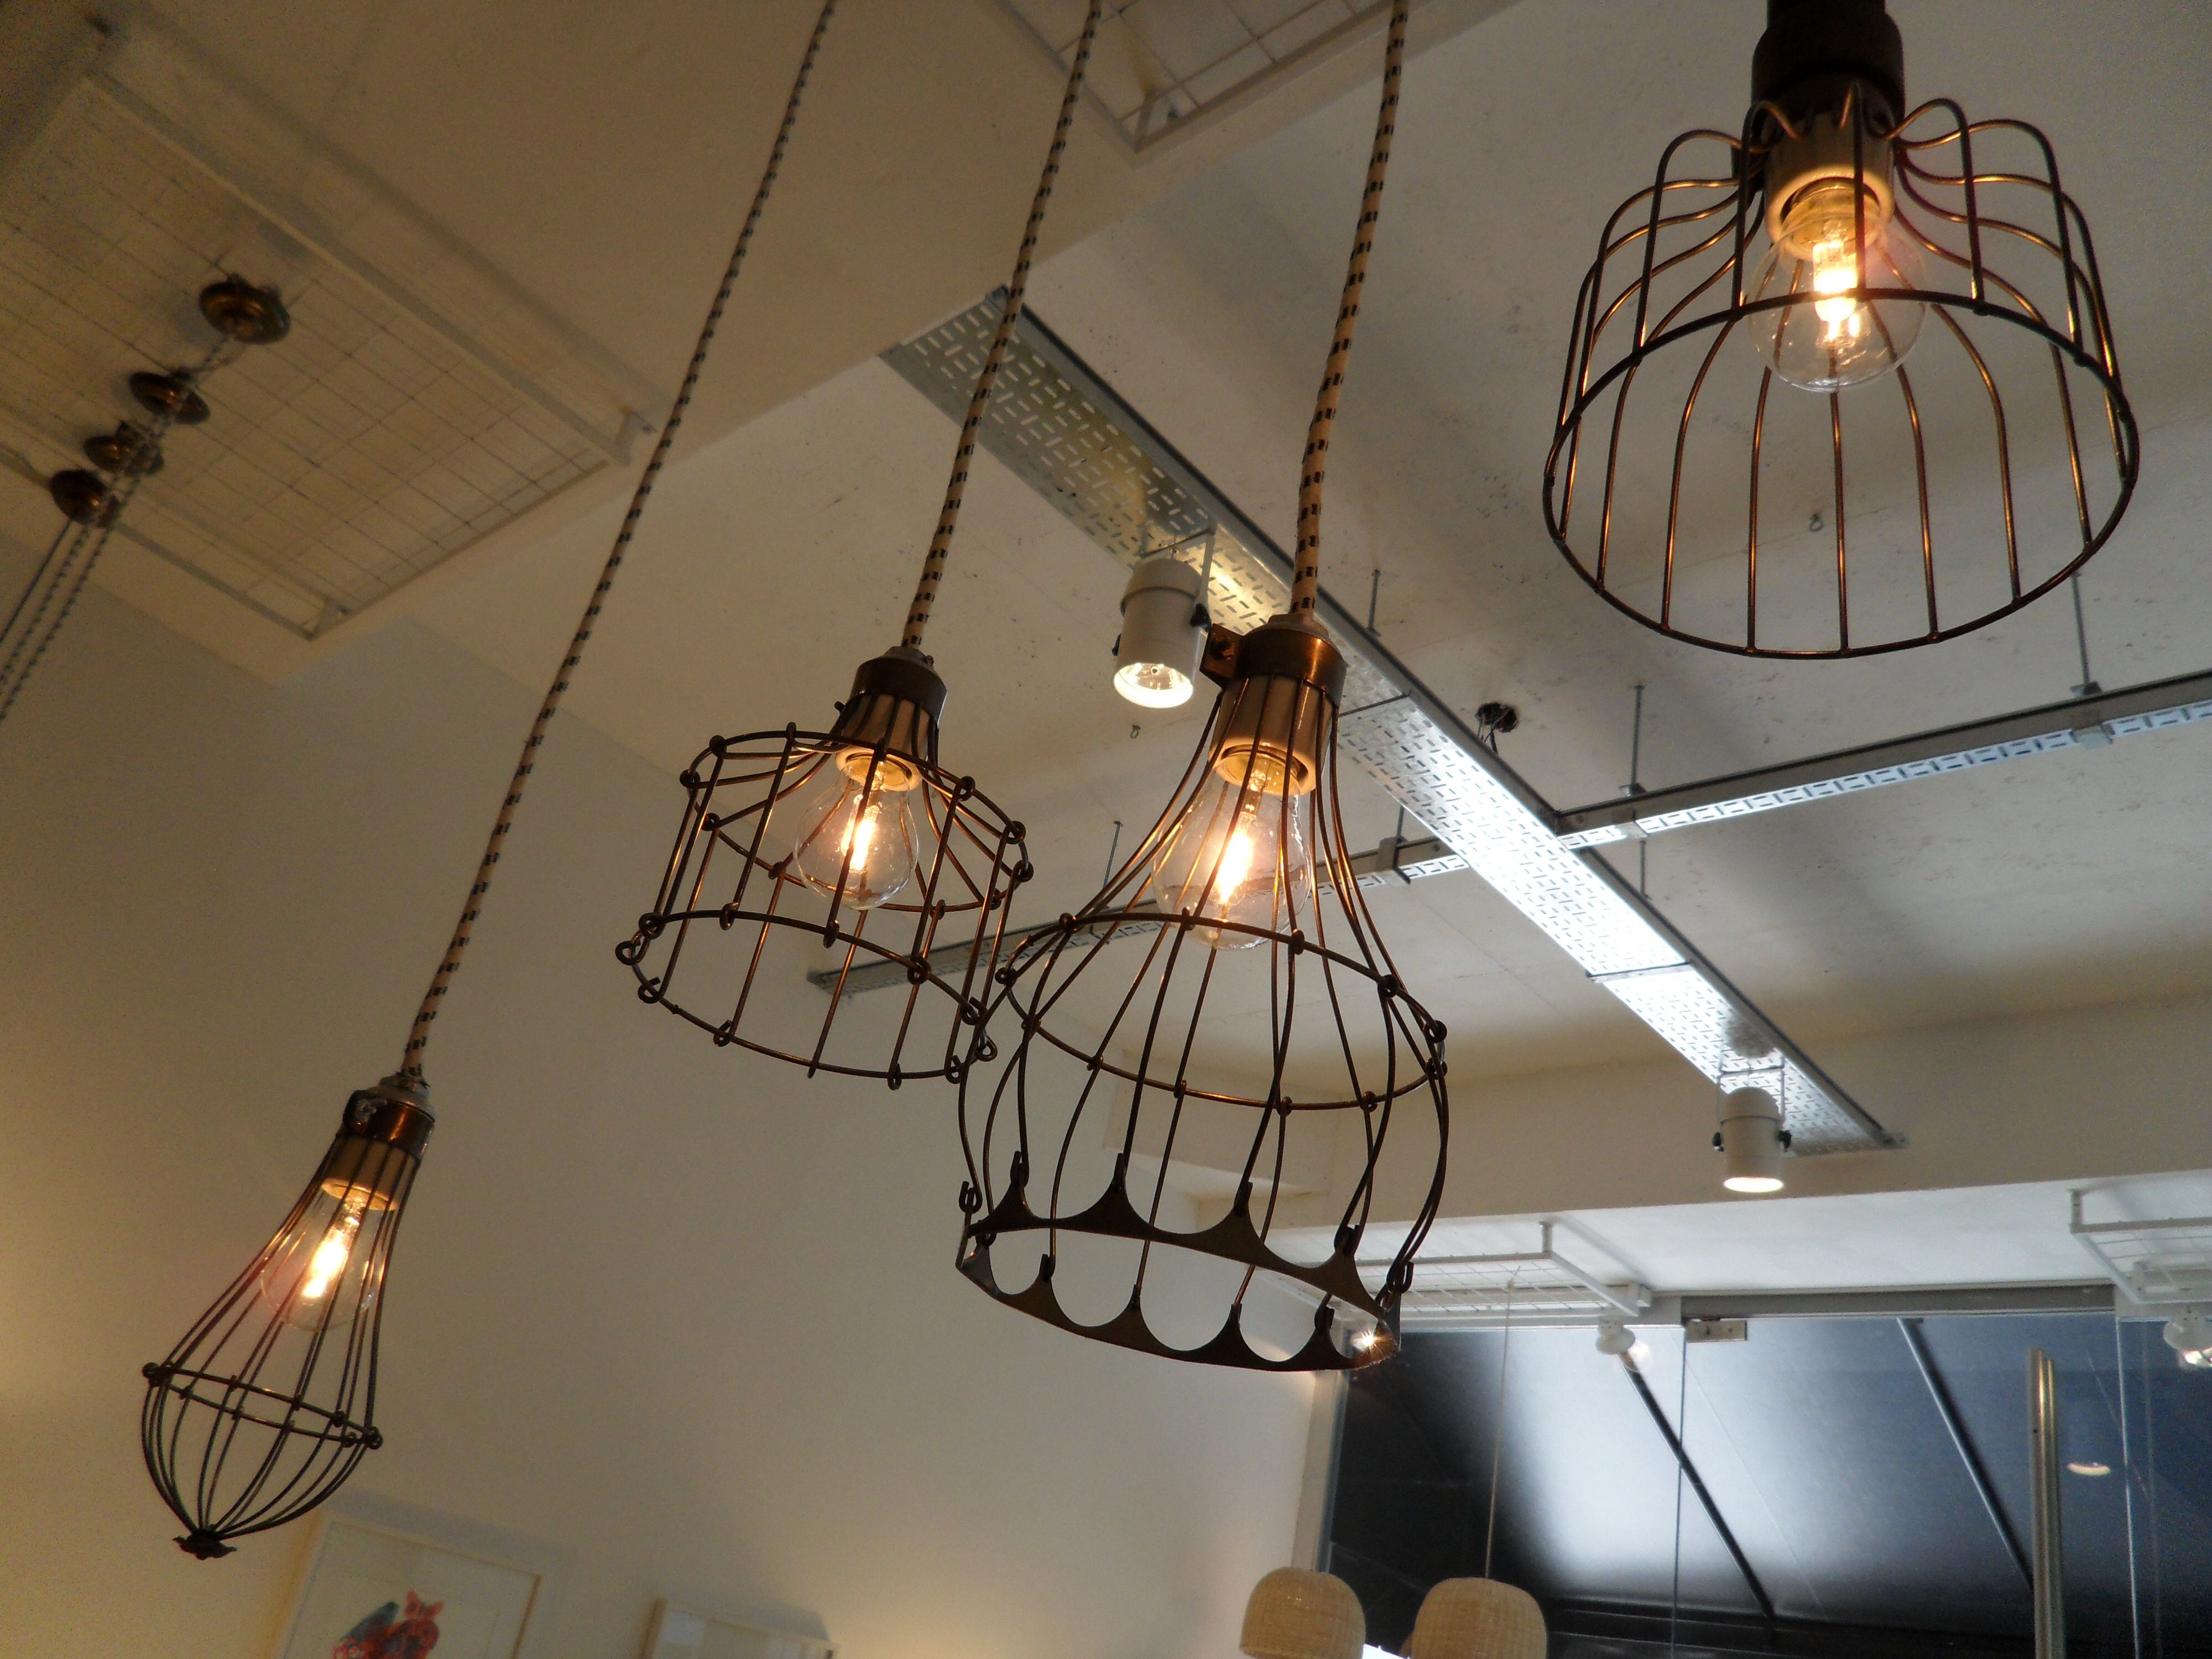 Lamparas de hierro | lamparas | Pinterest